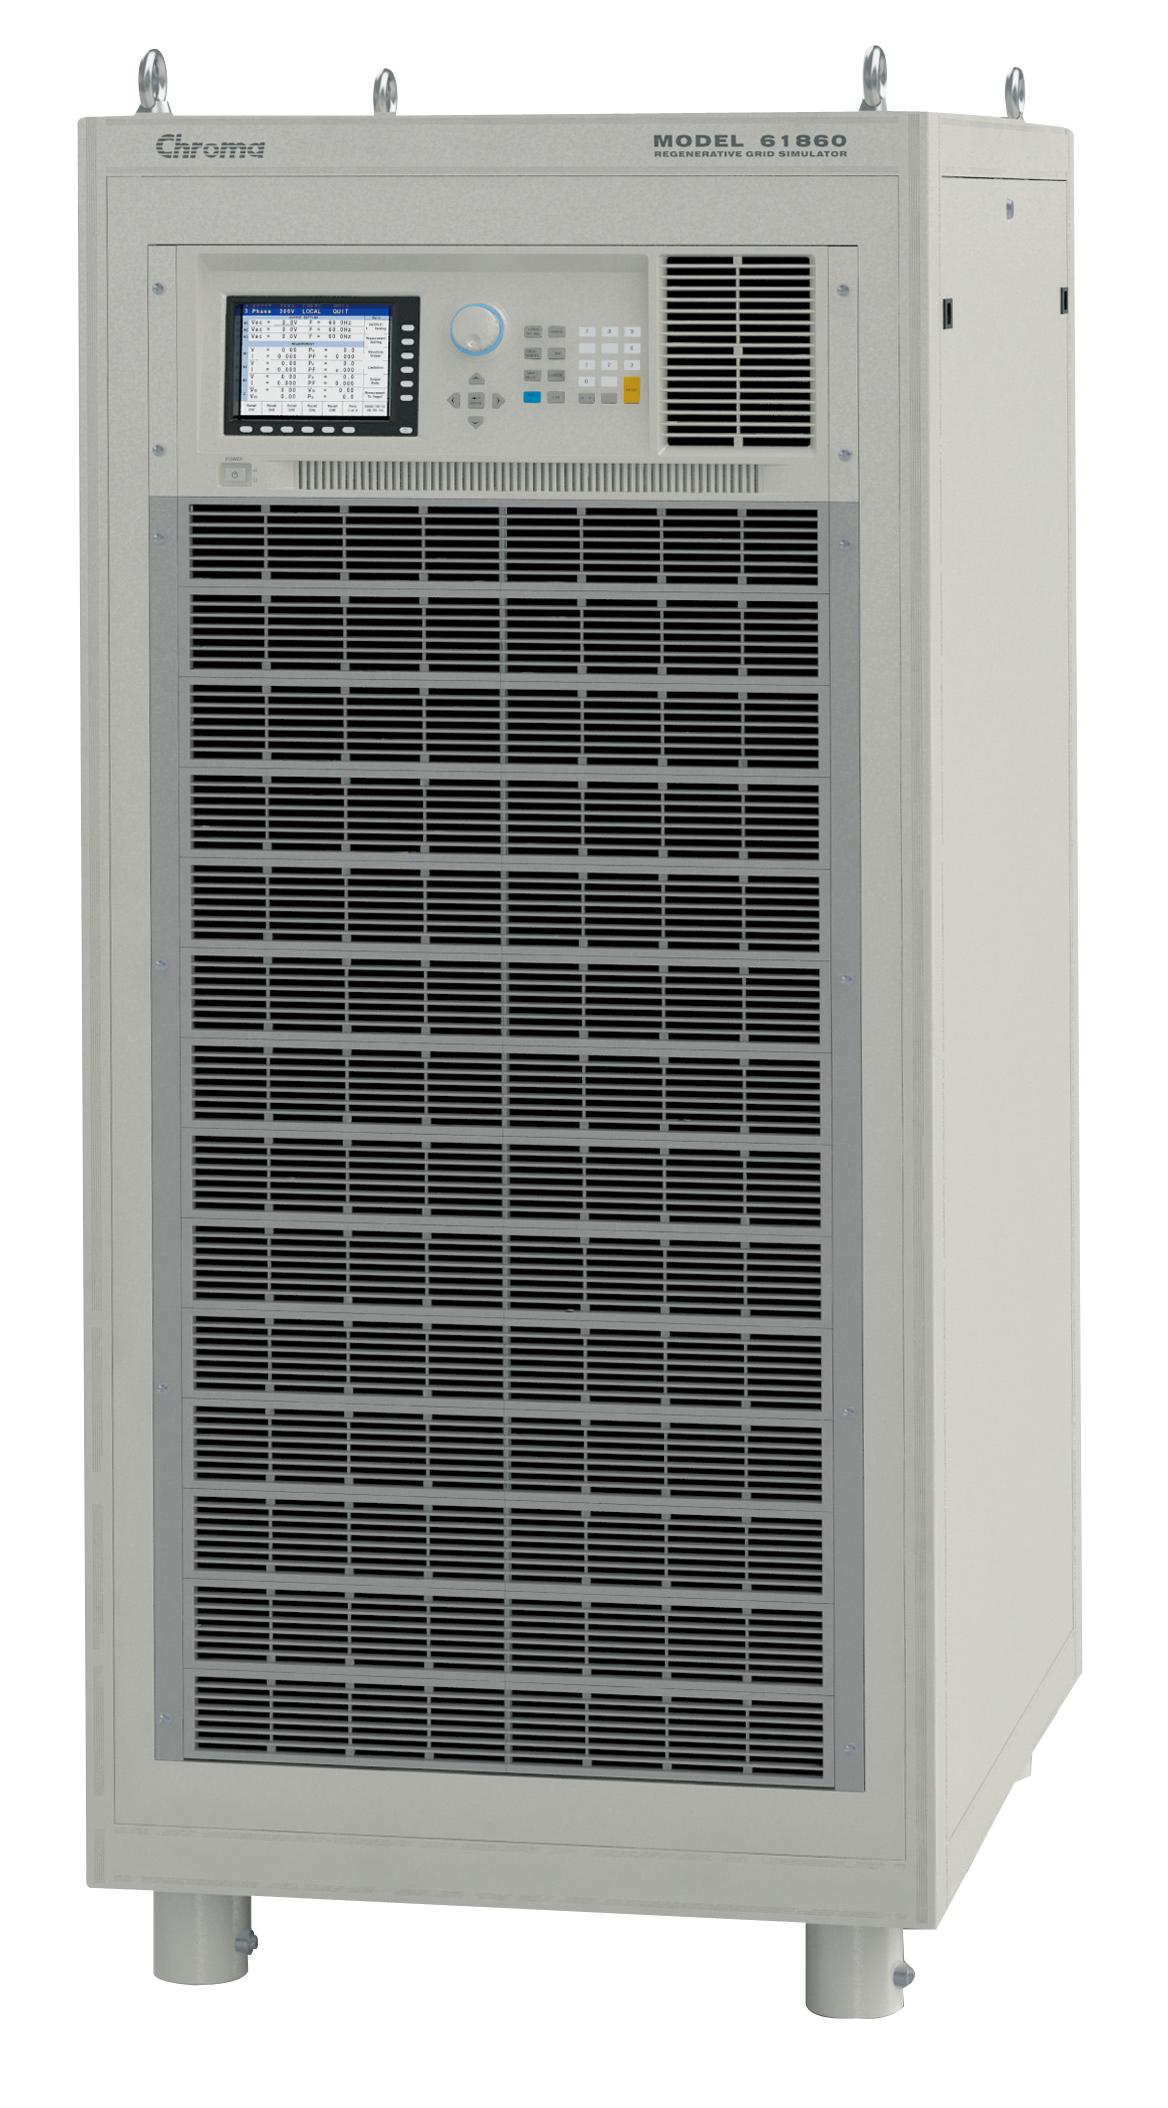 Chroma 61800 Series three-phase AC power supplies